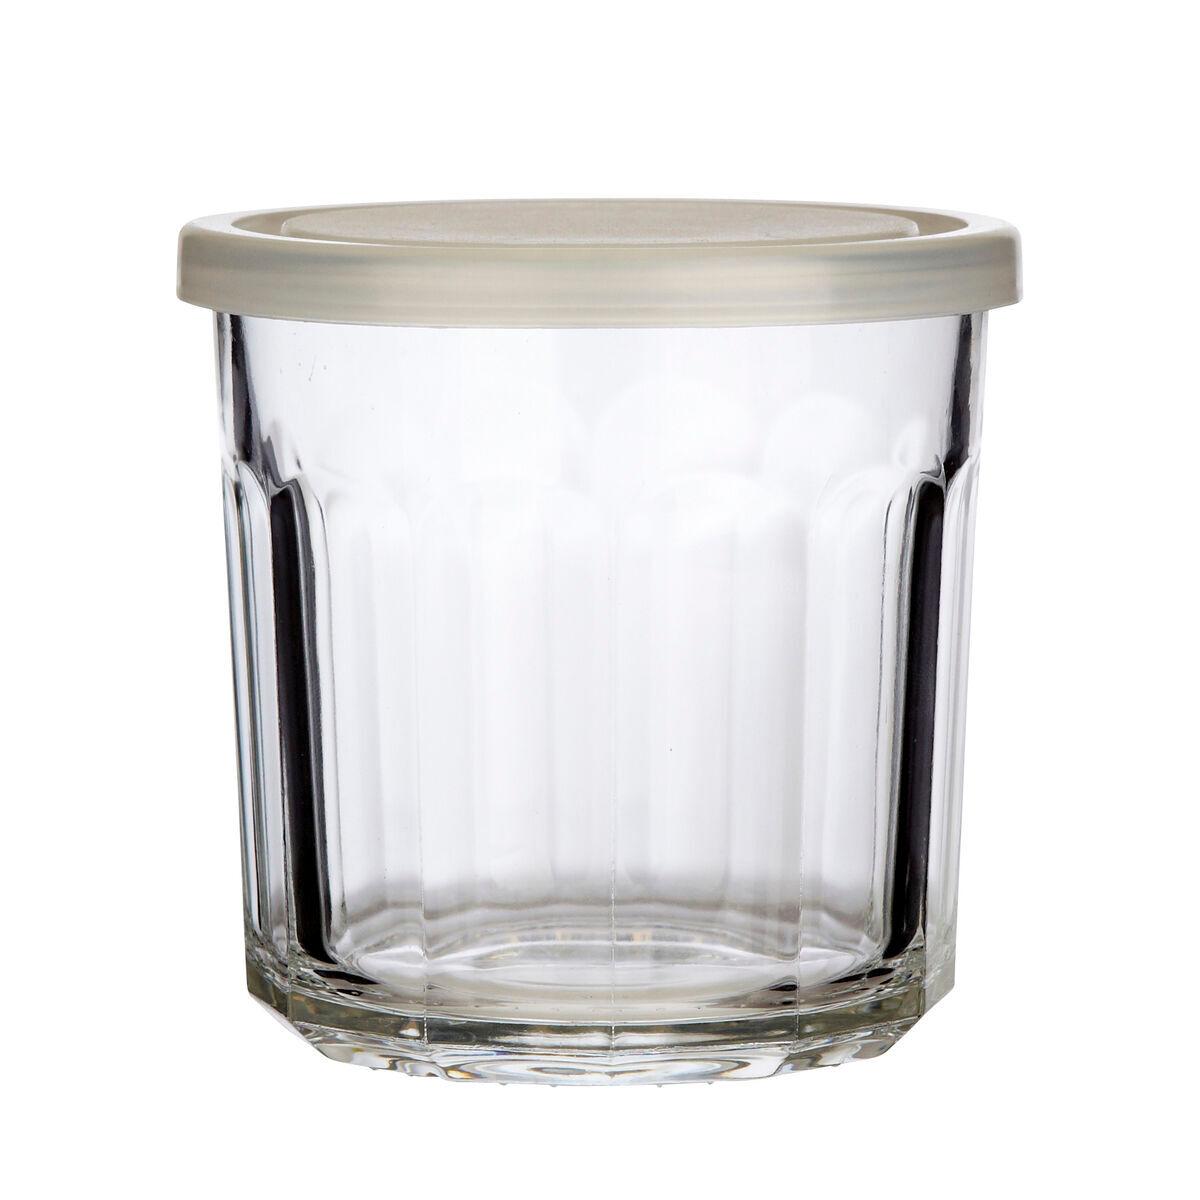 Hubsch Pot de confiture en verre H9